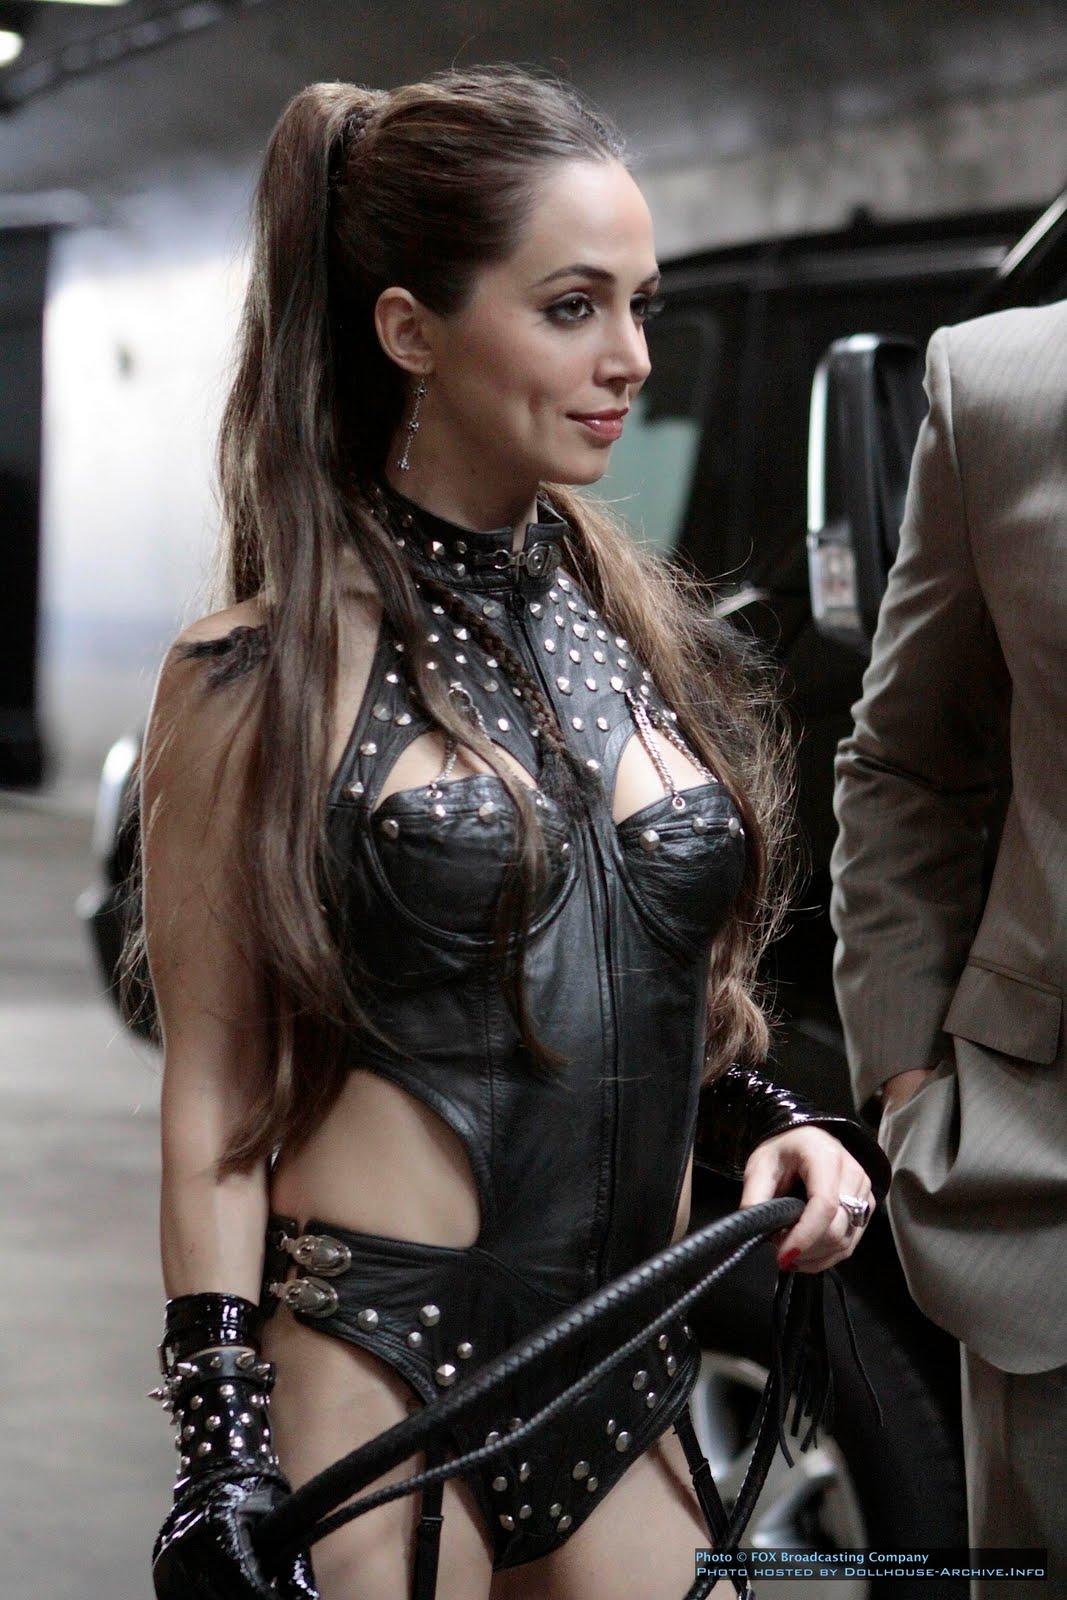 http://4.bp.blogspot.com/_hhYu4s9DHPk/TDN56BYKh9I/AAAAAAAAAE0/5Gapwu6c7GI/s1600/Eliza-dushku-leather_dollhouse_echo.jpg